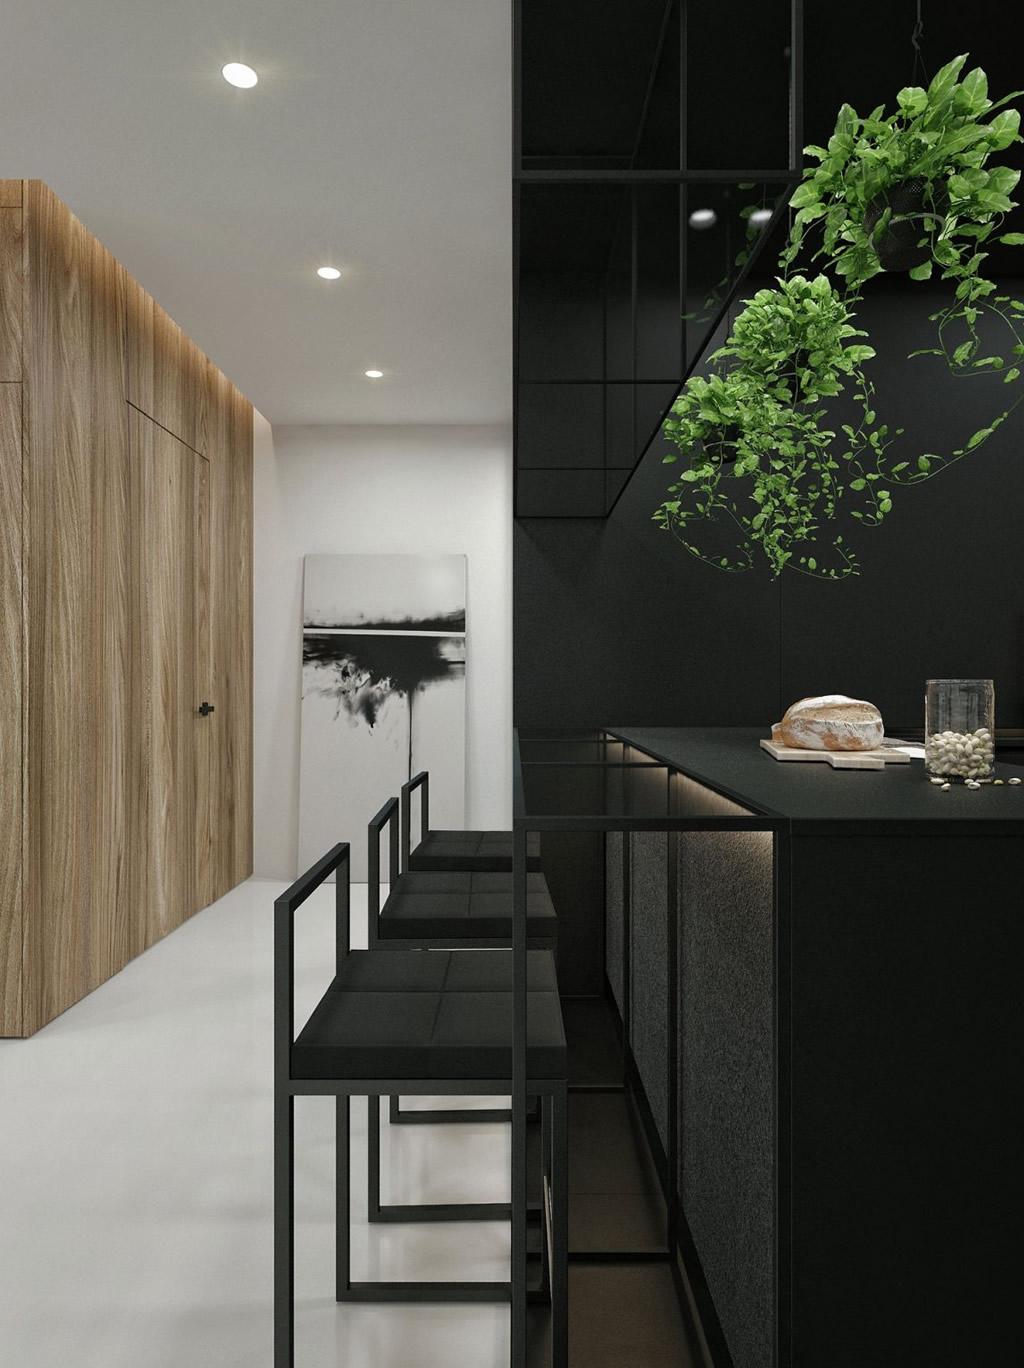 Cozy Modern Apartment In Kaunas, Lithuania 9